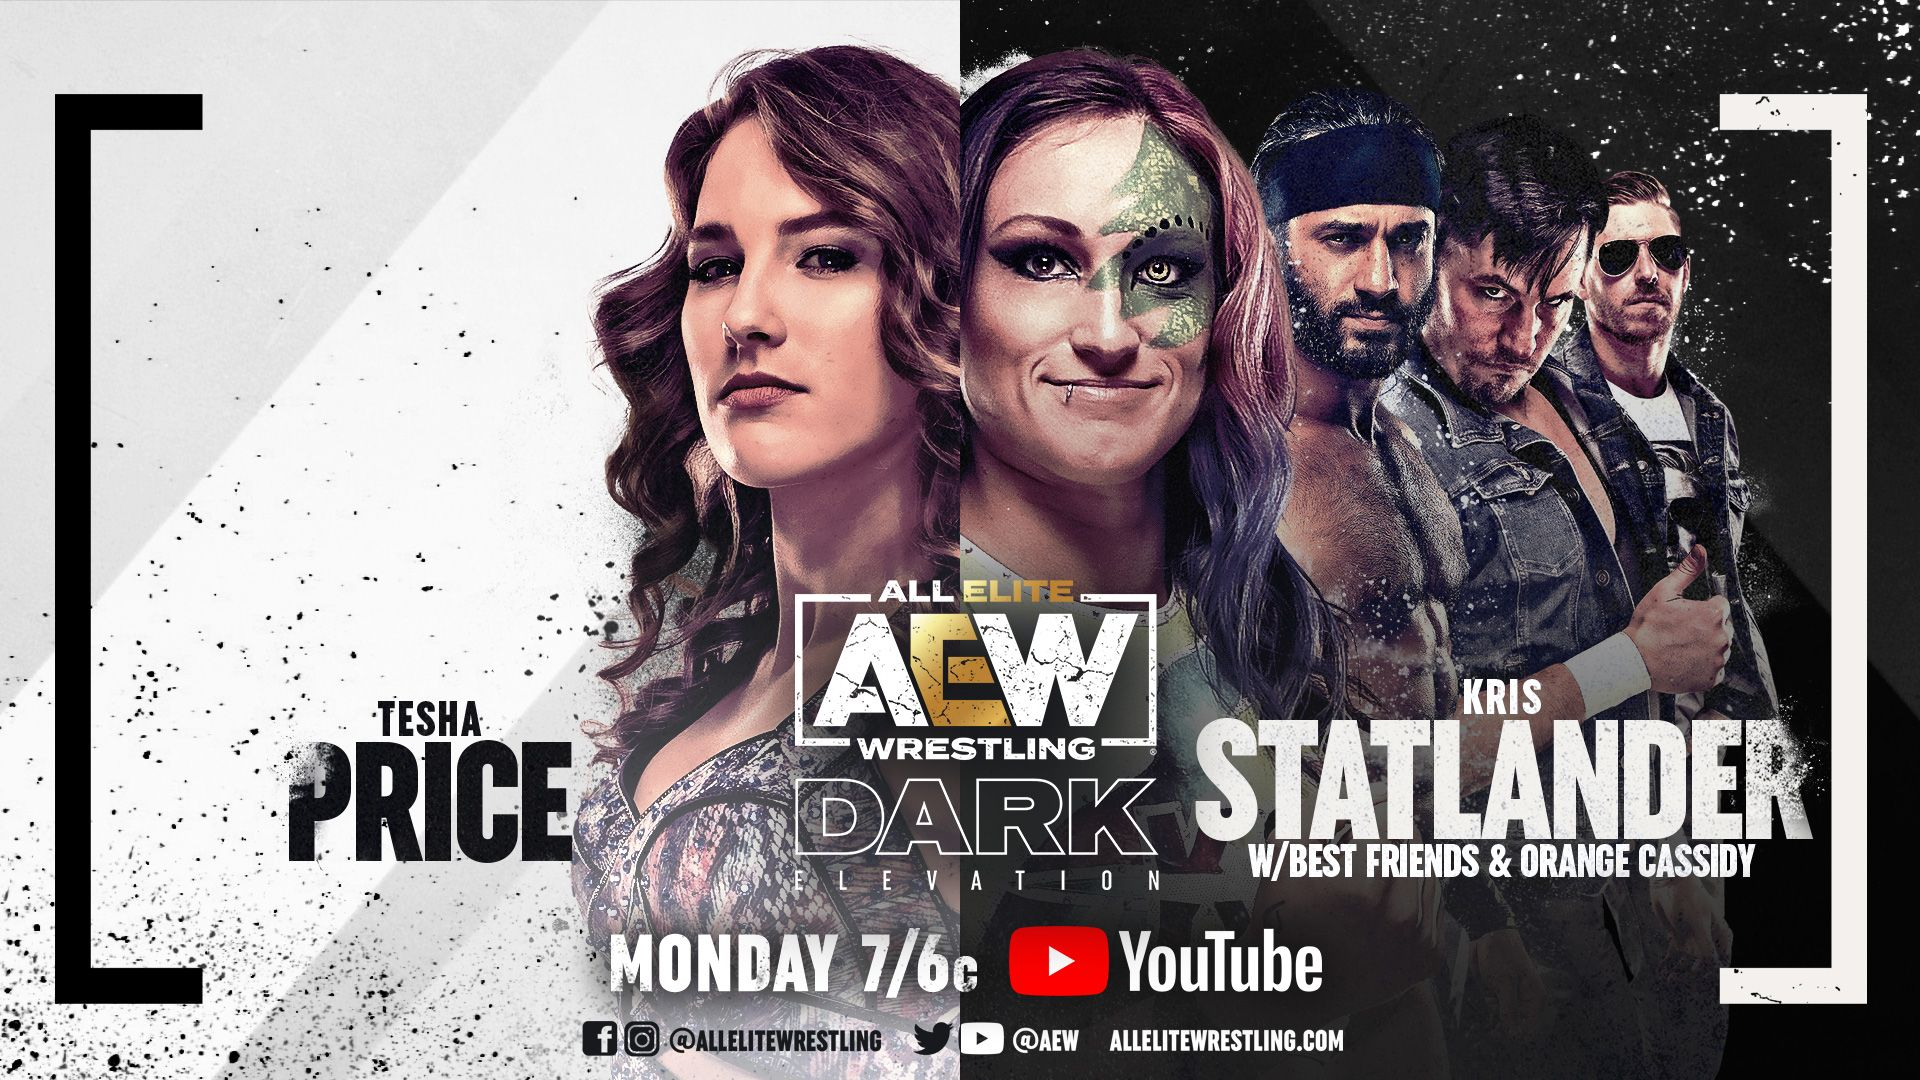 Additional matches added to tonight's Dark Elevation plus Rising Star segment for Leyla Hirsch